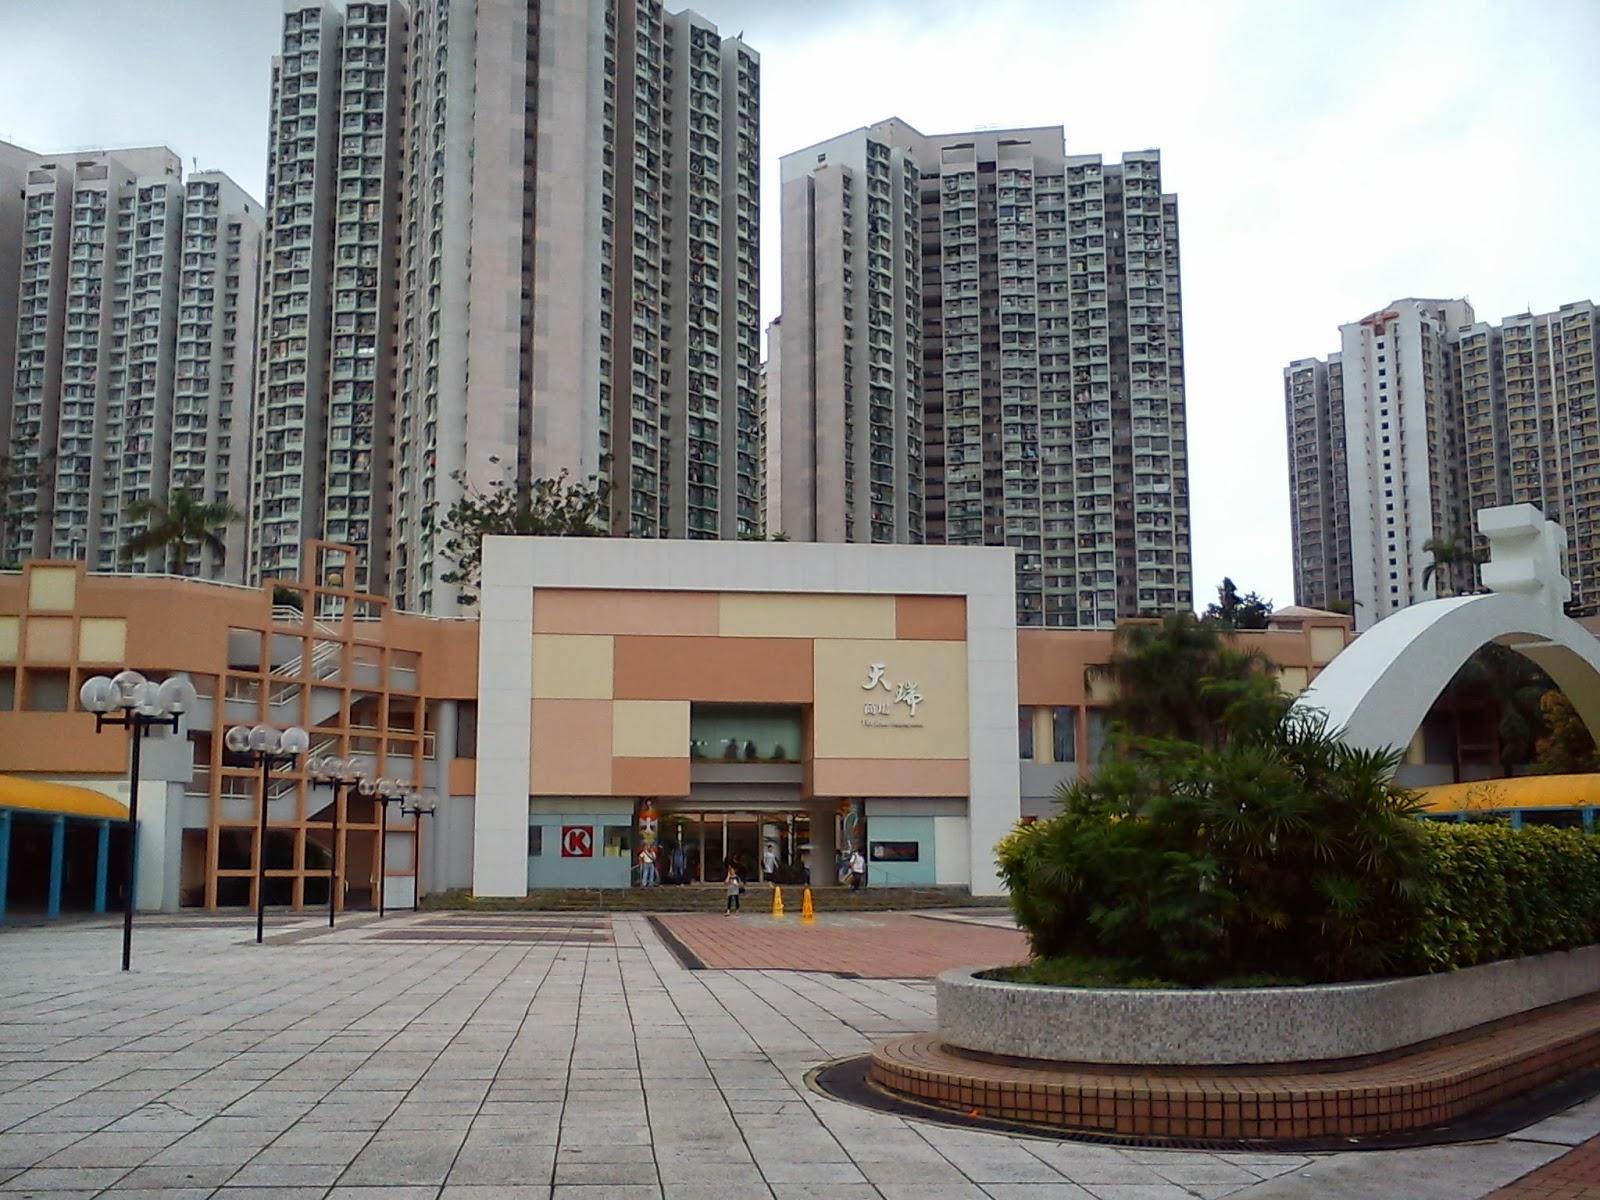 Grassroots O2: 巡視業務.領匯.天瑞商場 @2013-04-20